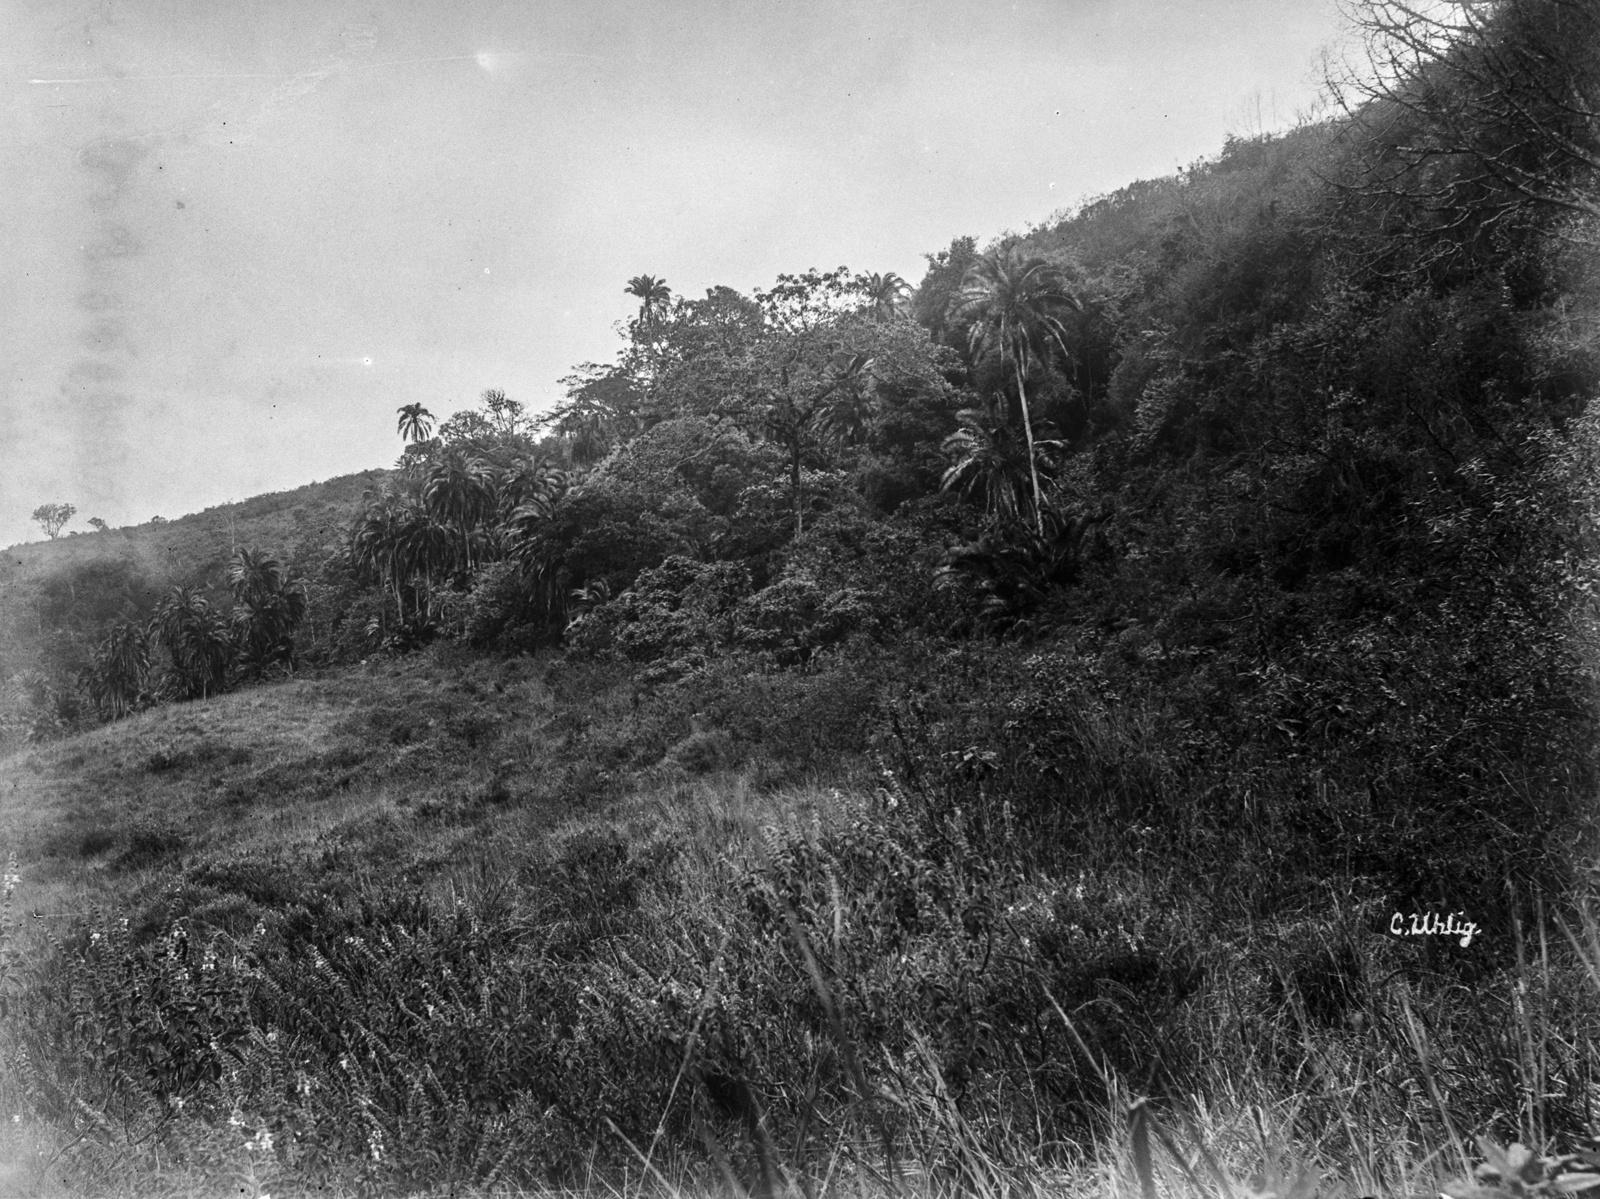 142. Вид горного склона на границе тропического леса при подъеме на вершину Меру